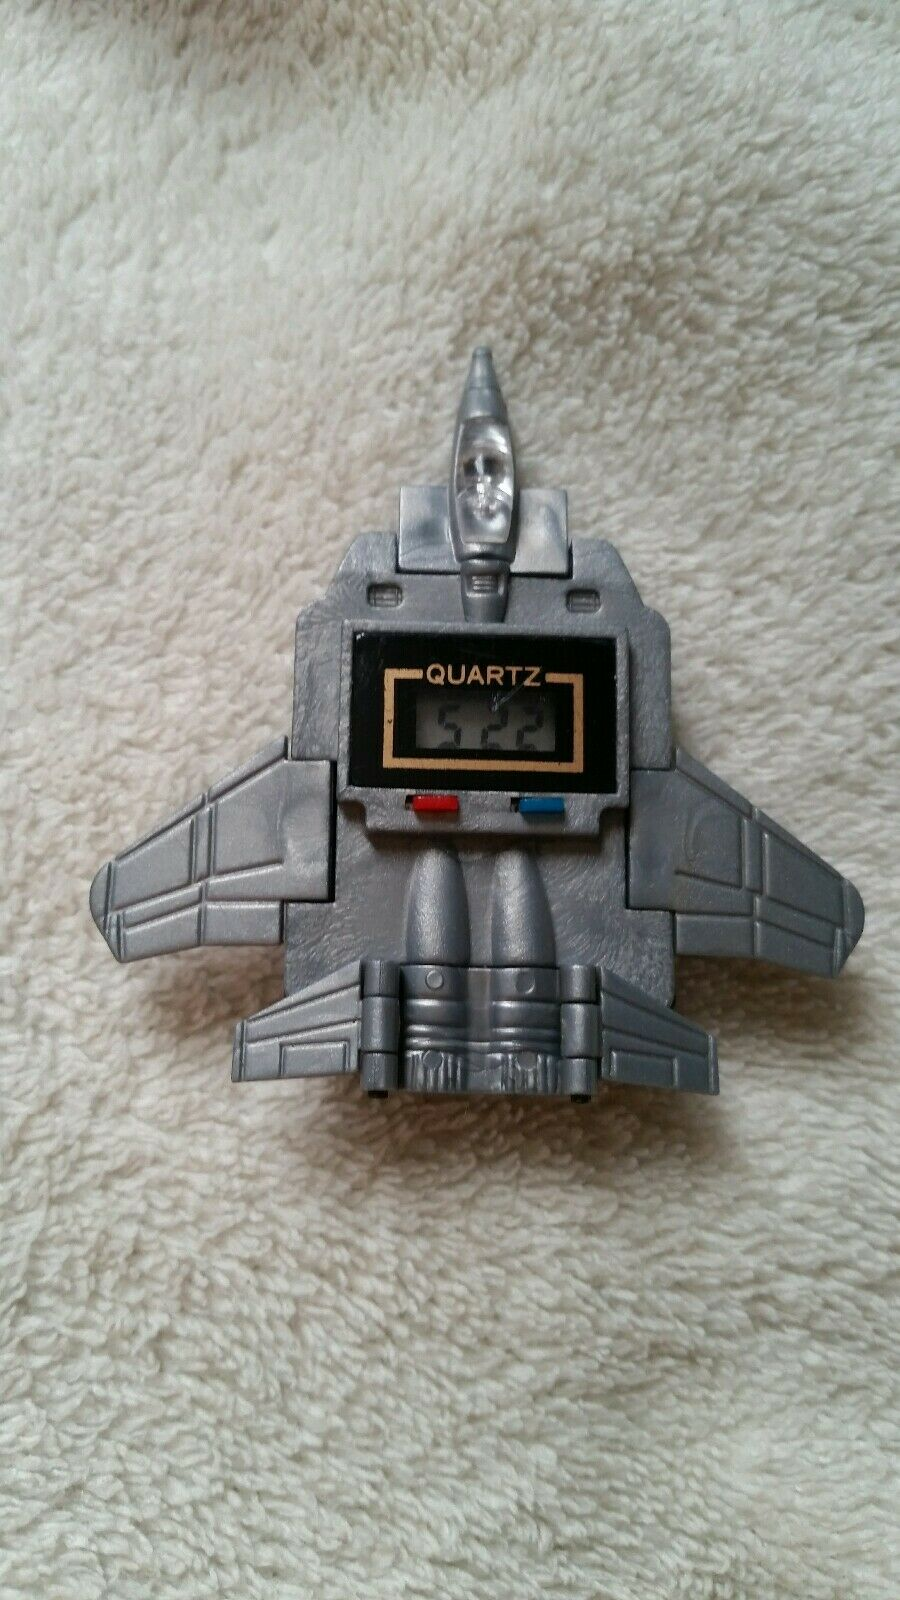 Transformers Quartz Watch Uhr Reloj